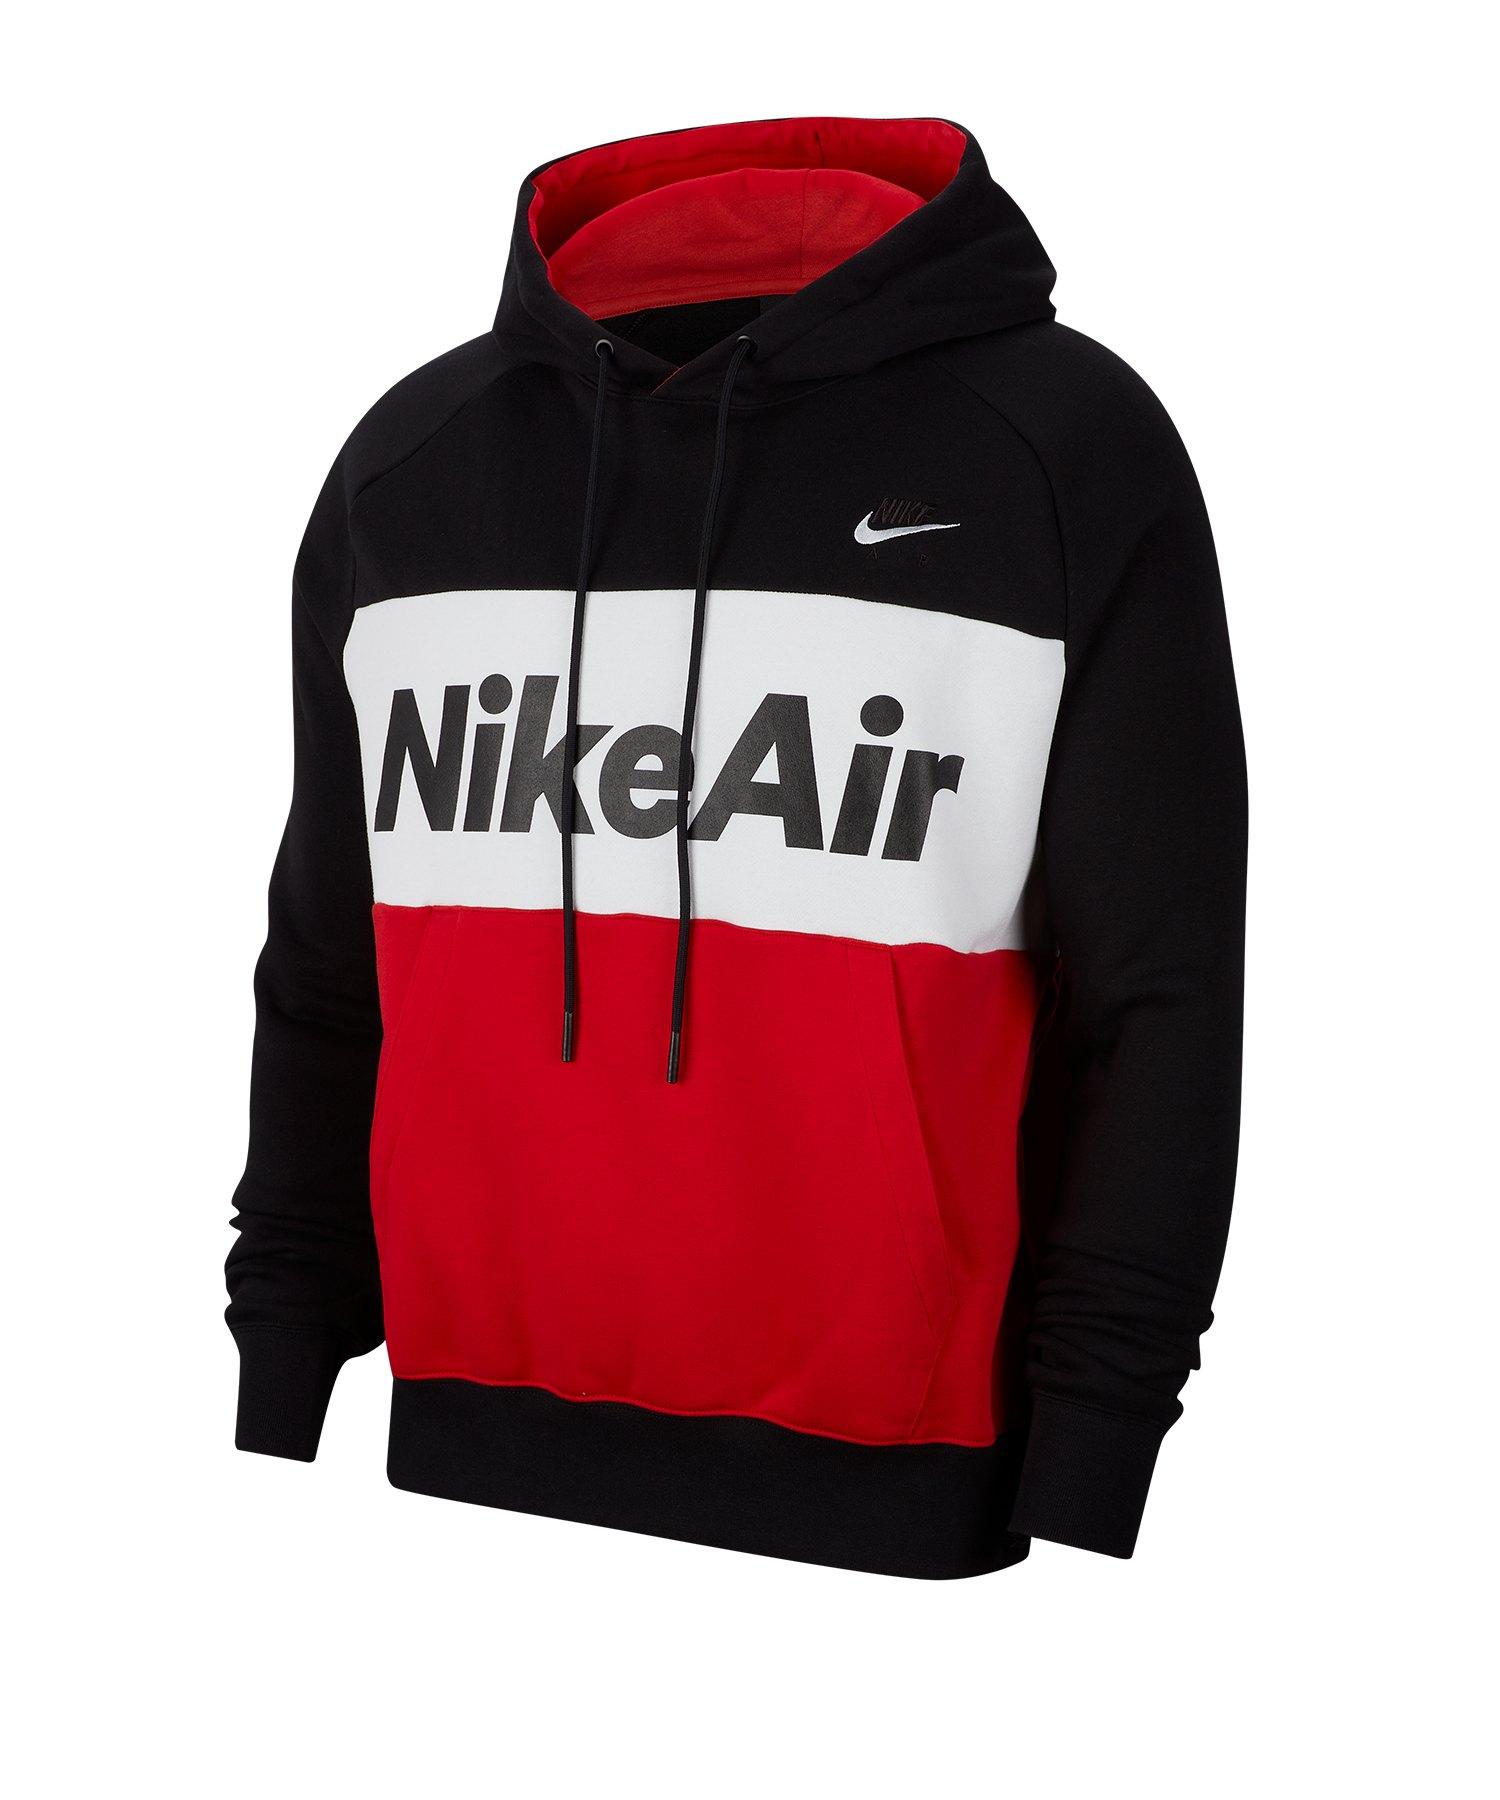 Nike Air Fleece Kapuzensweatshirt Schwarz F011 - schwarz